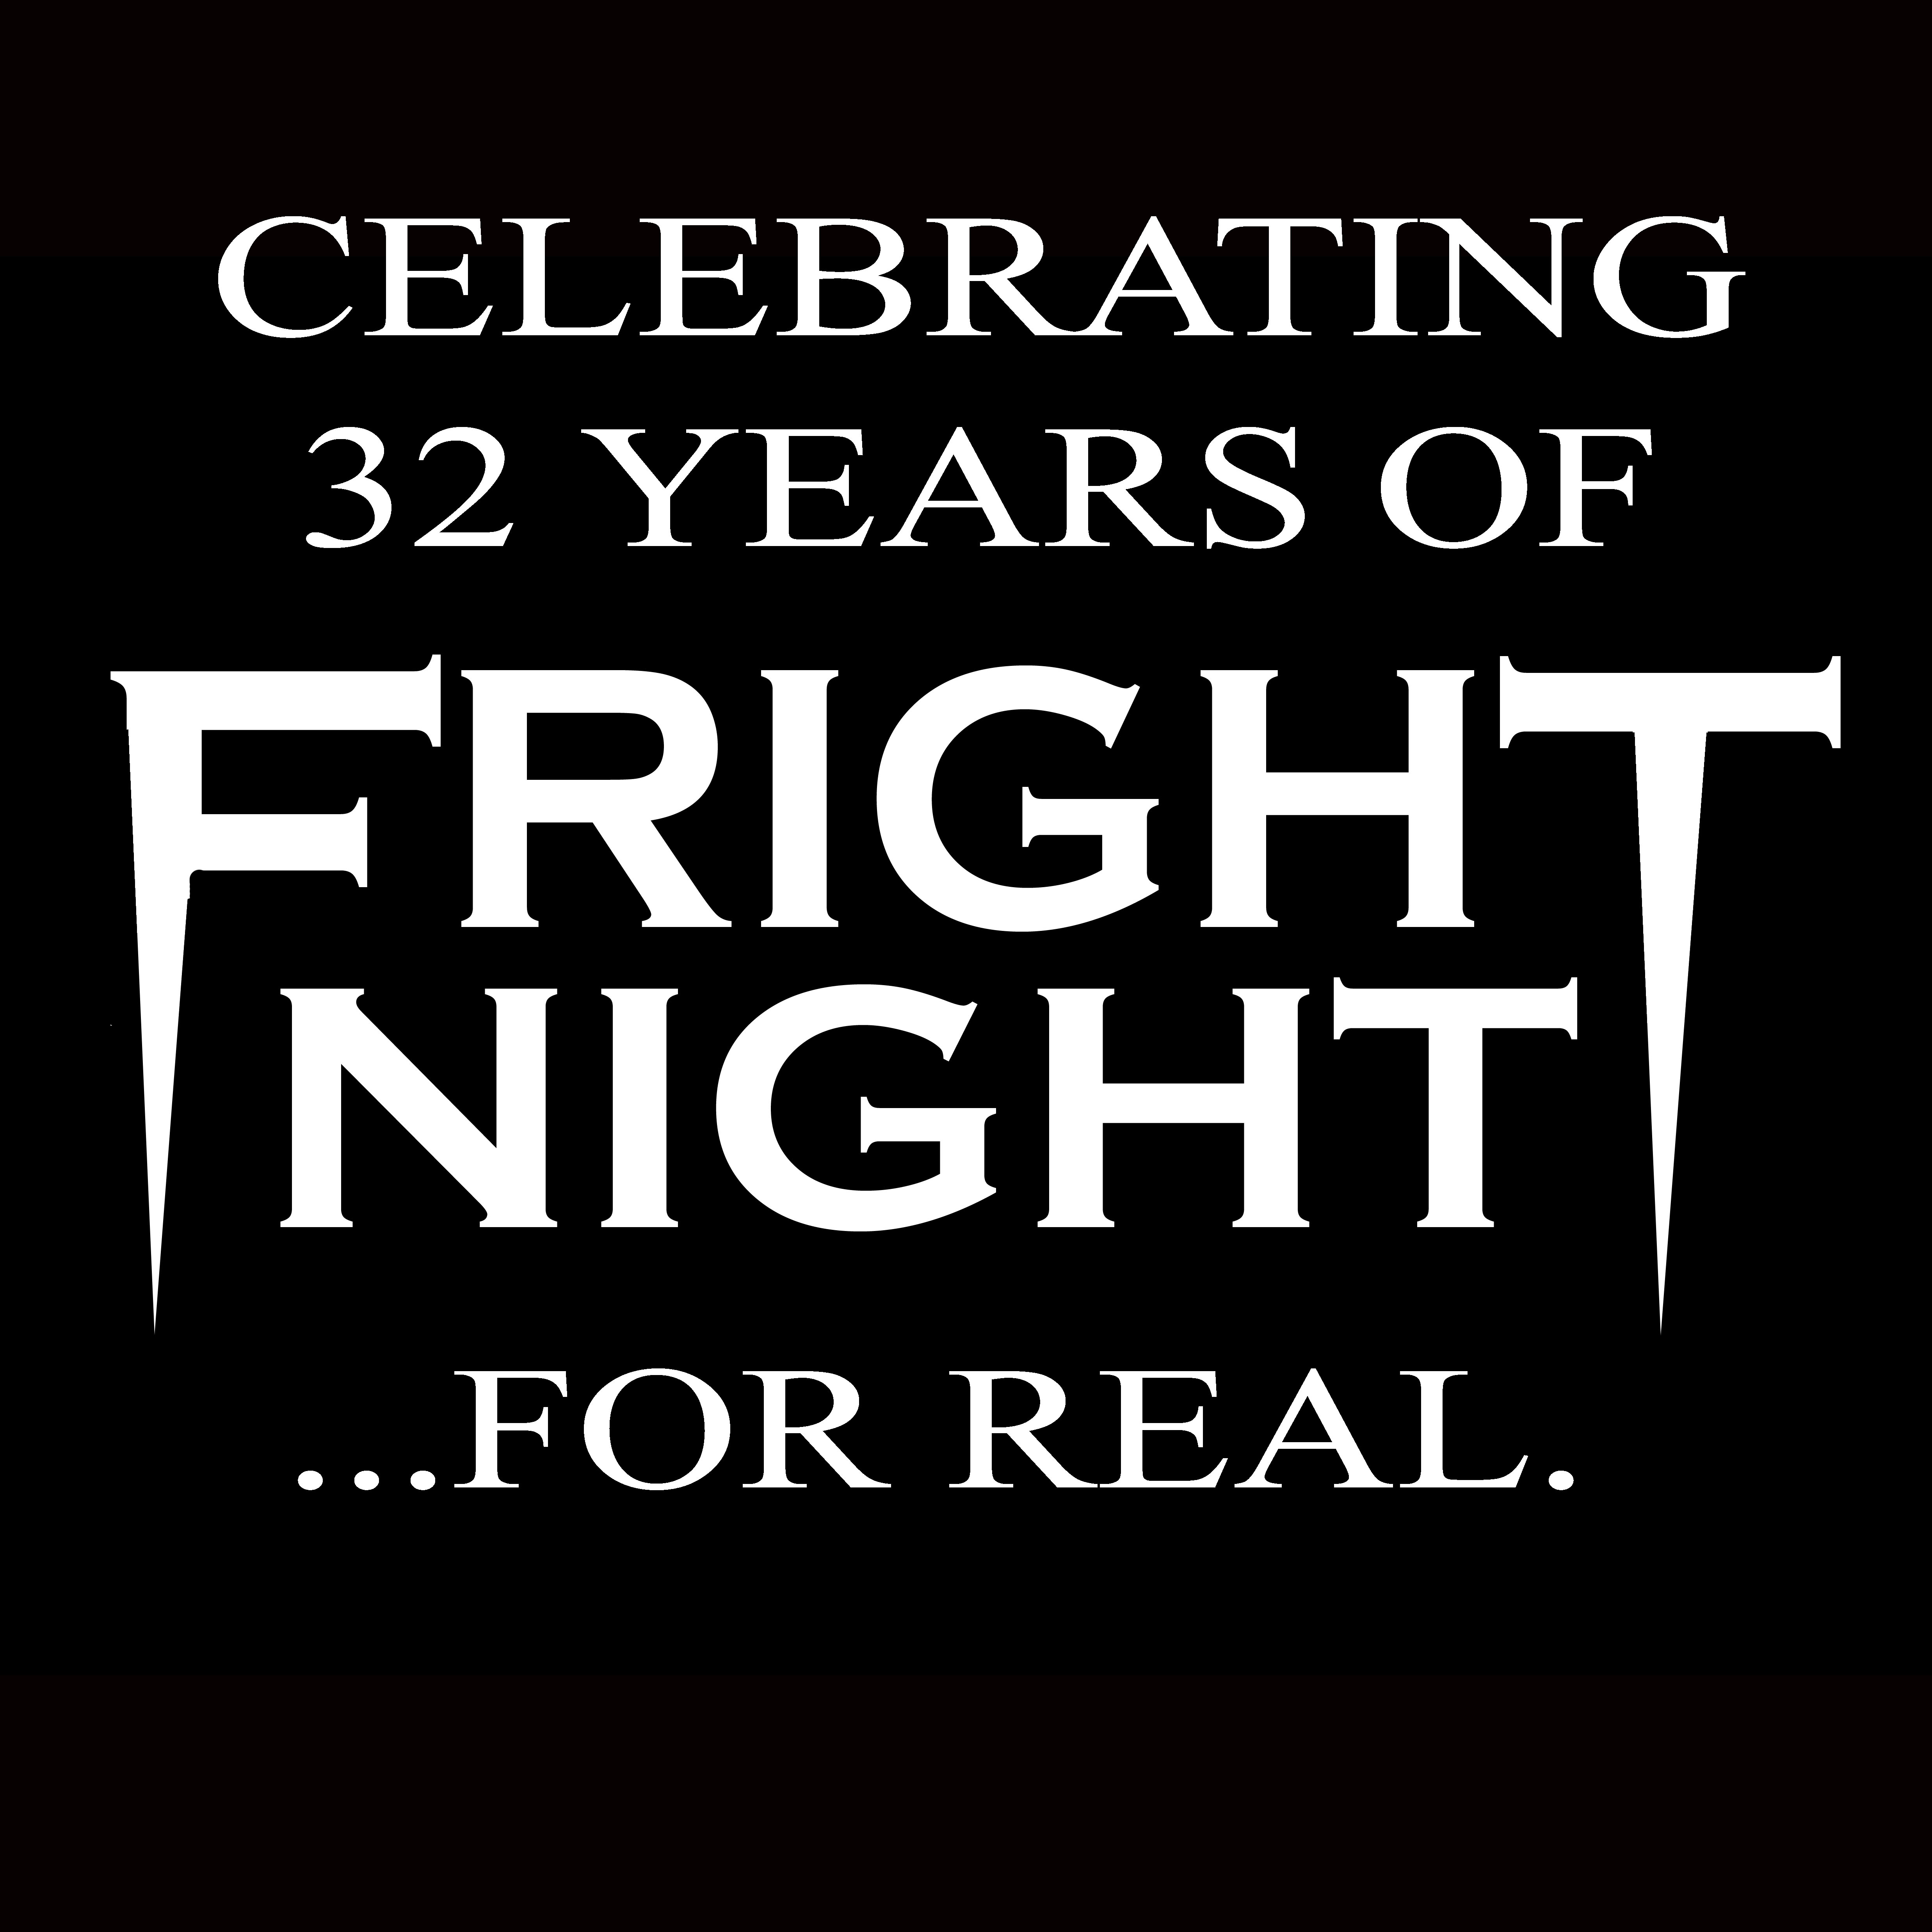 fright-night32.jpg